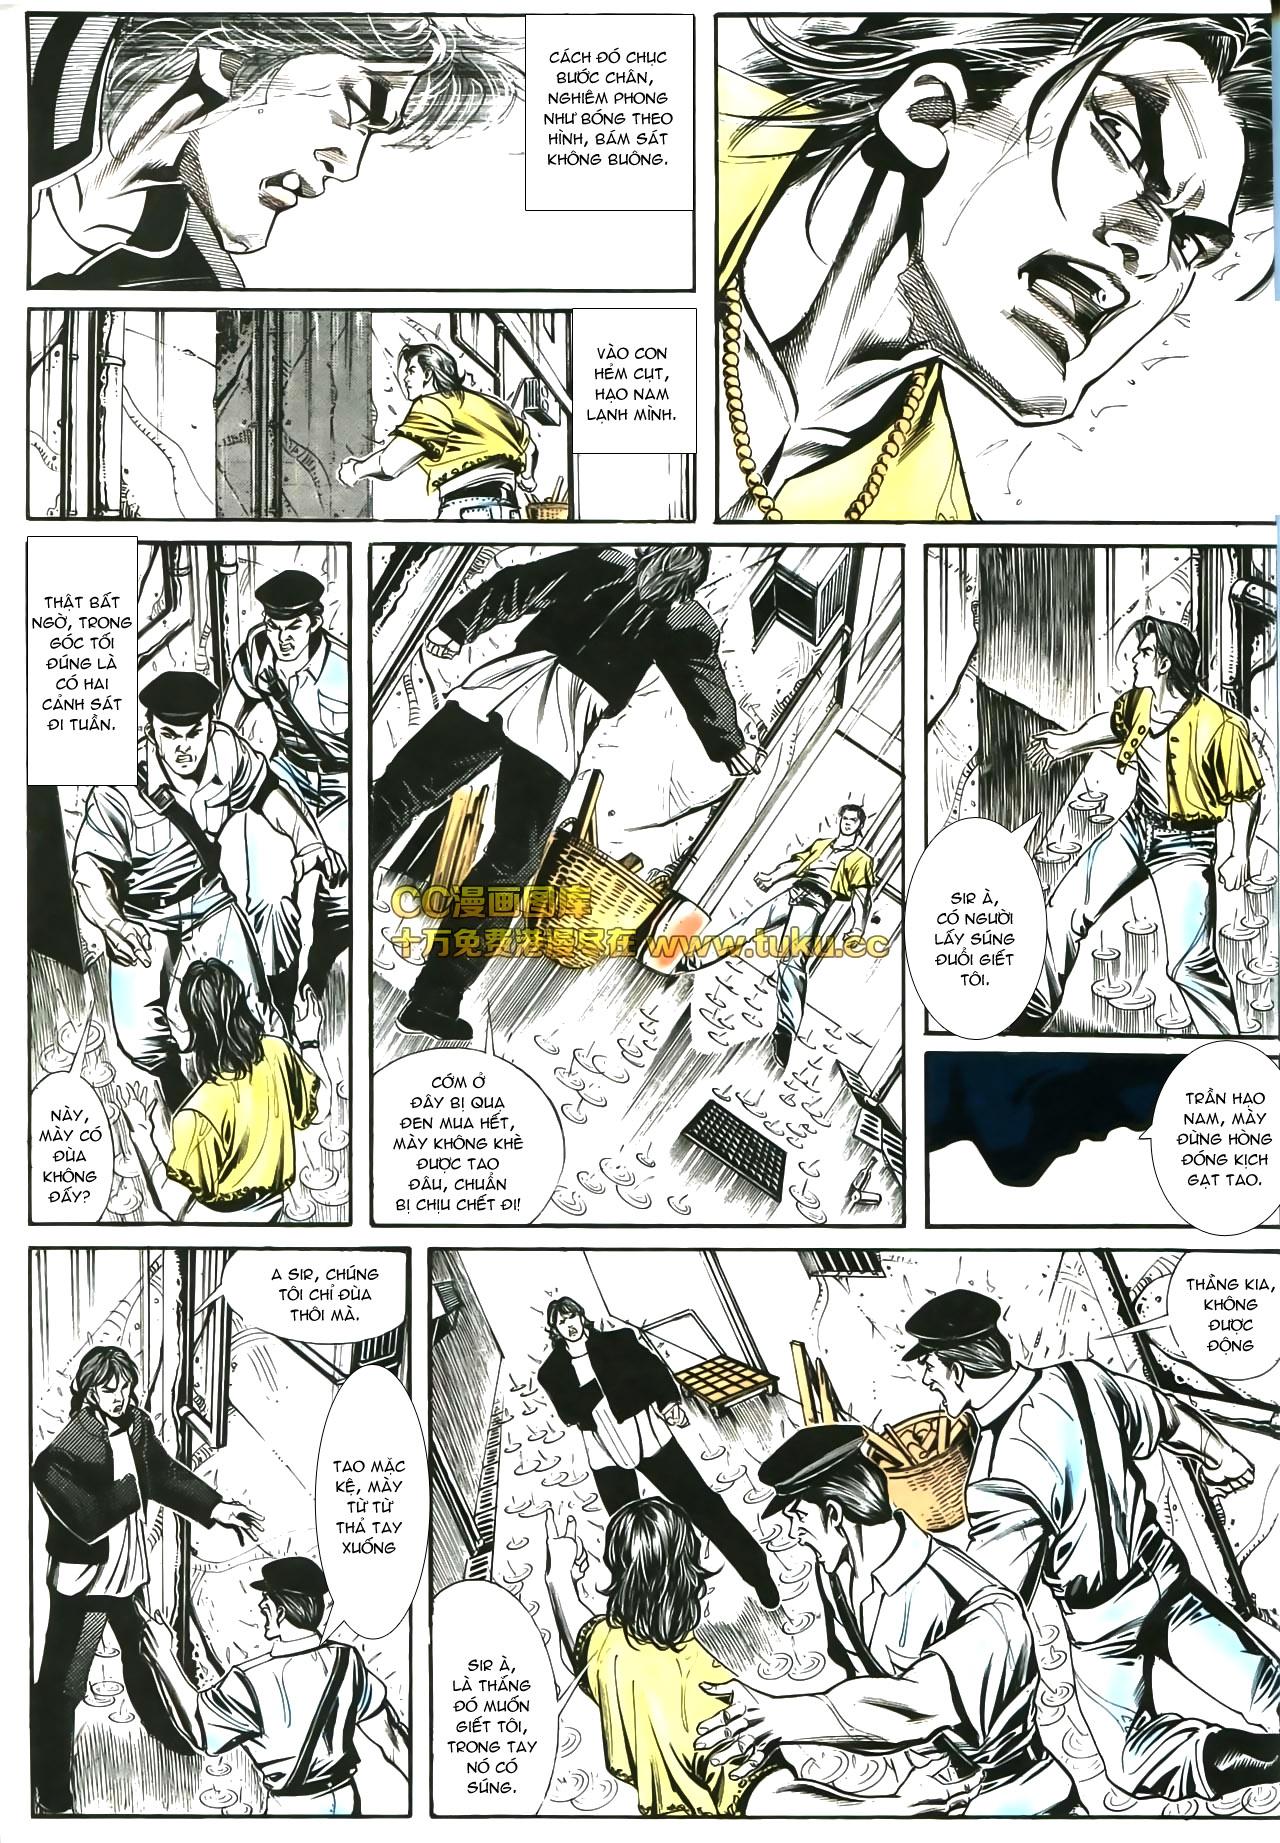 Người Trong Giang Hồ chapter 173: da ngựa bọc thây trang 23